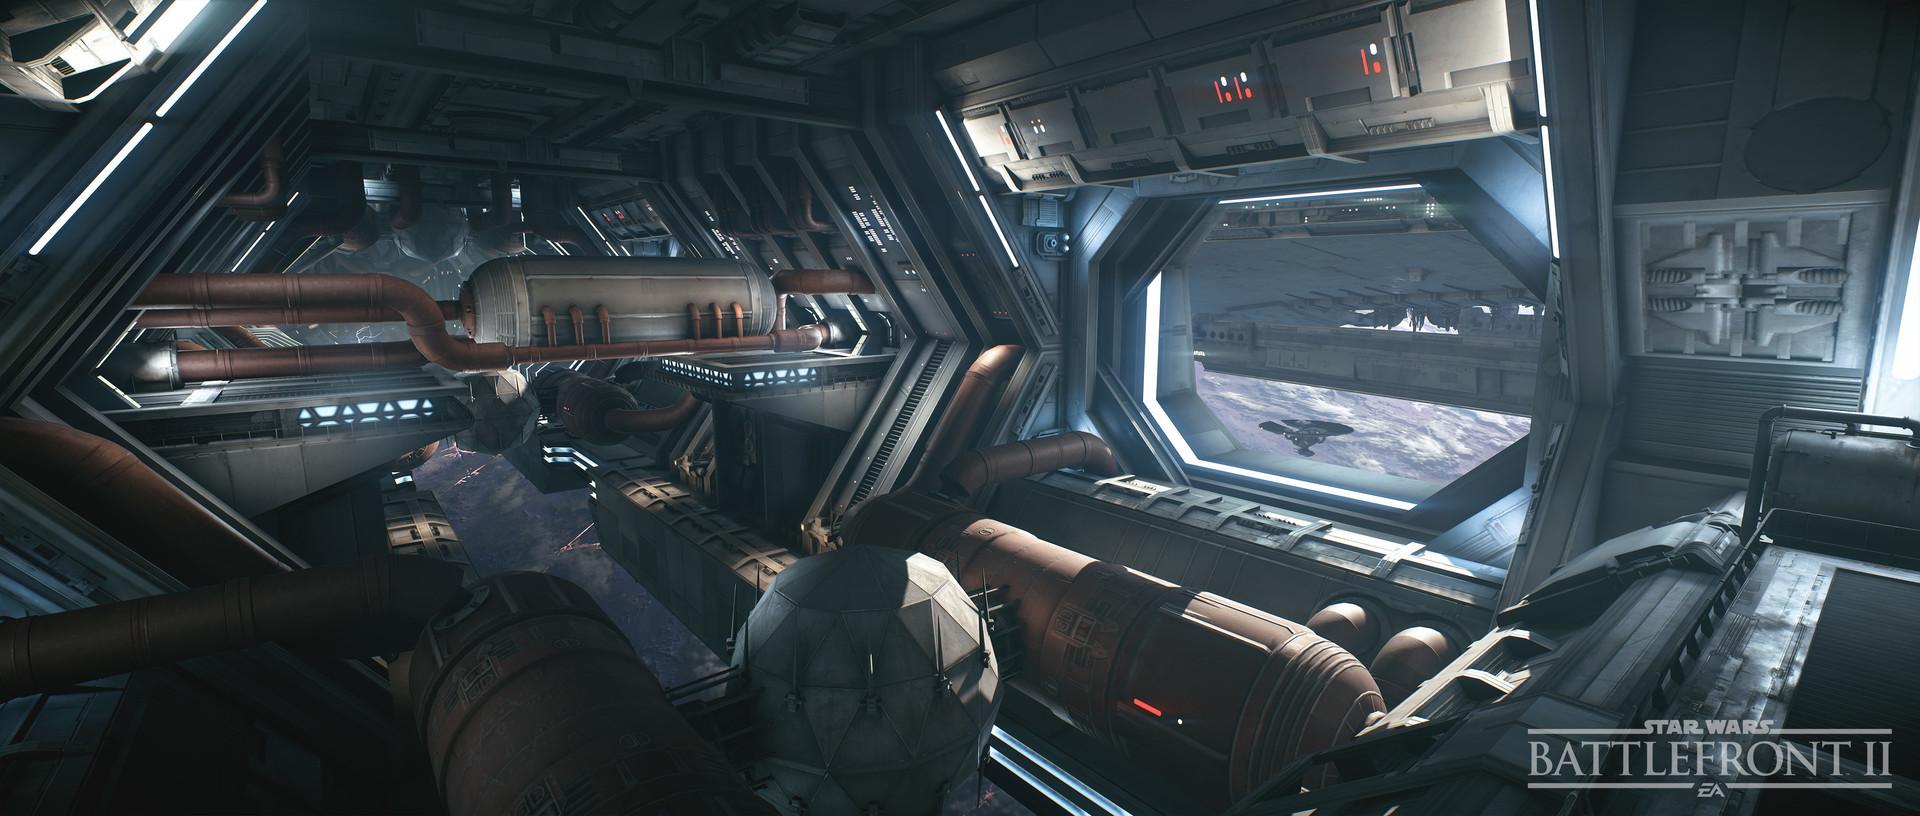 Darius kalinauskas fondor dock starwars conceptart battlefront 6